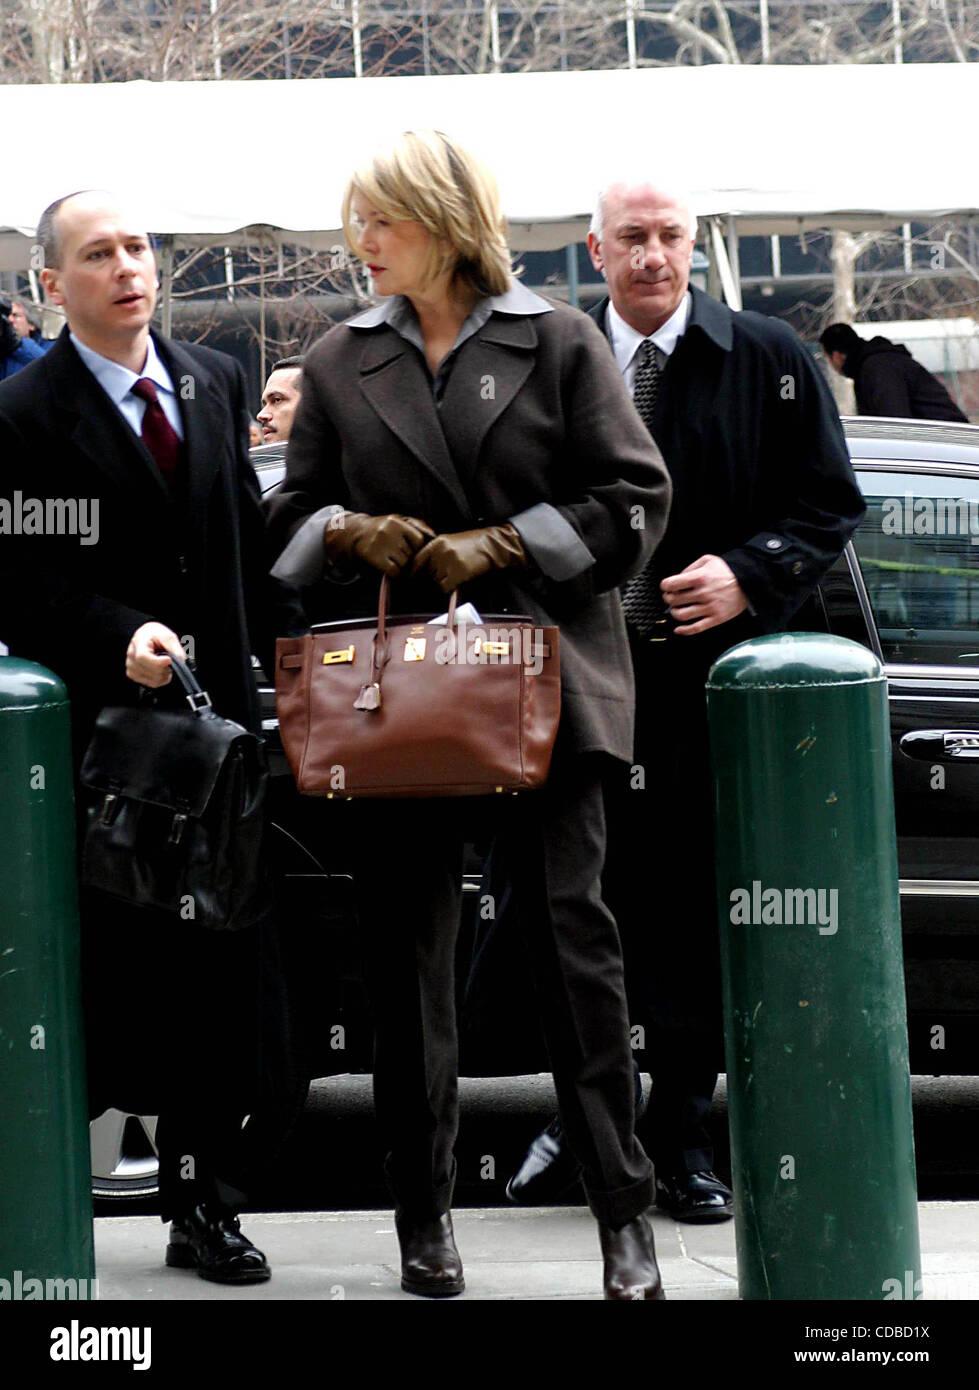 2011 Manhattan New York Trip: Jan 04 2011 Manhattan New Stock Photos & Jan 04 2011